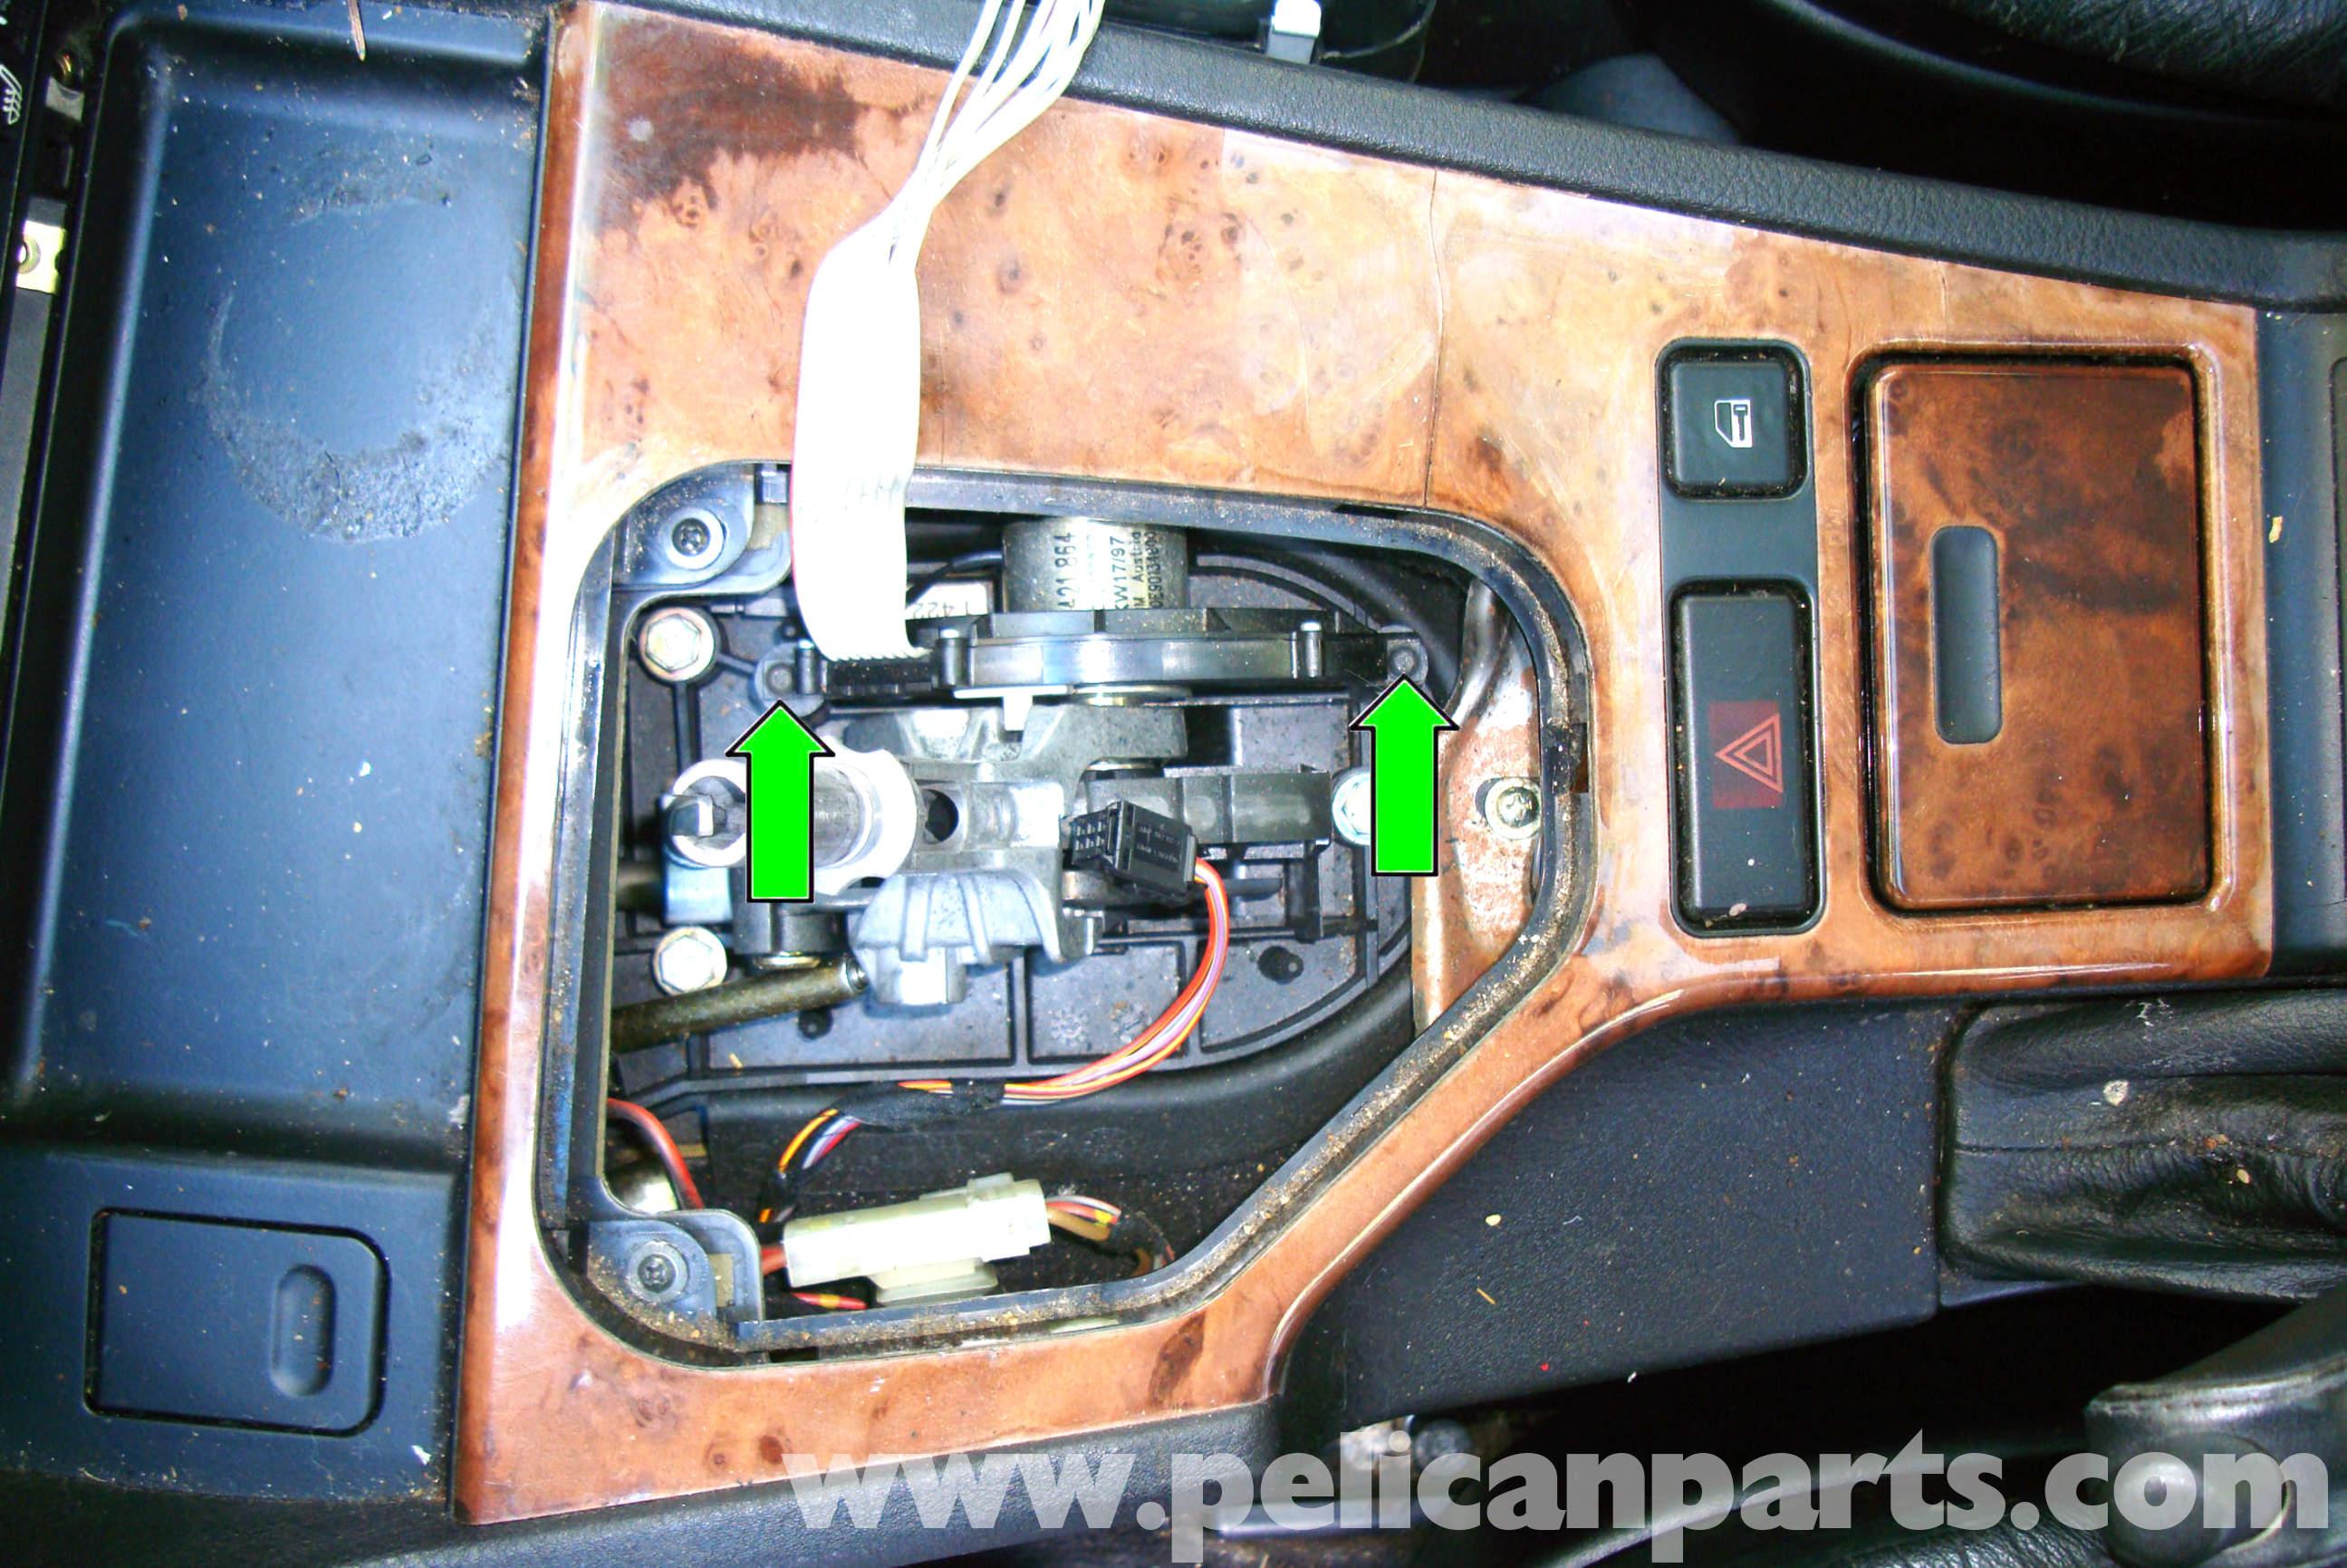 pic04 bmw e39 5 series center console removal 1997 2003 525i, 528i, 530i